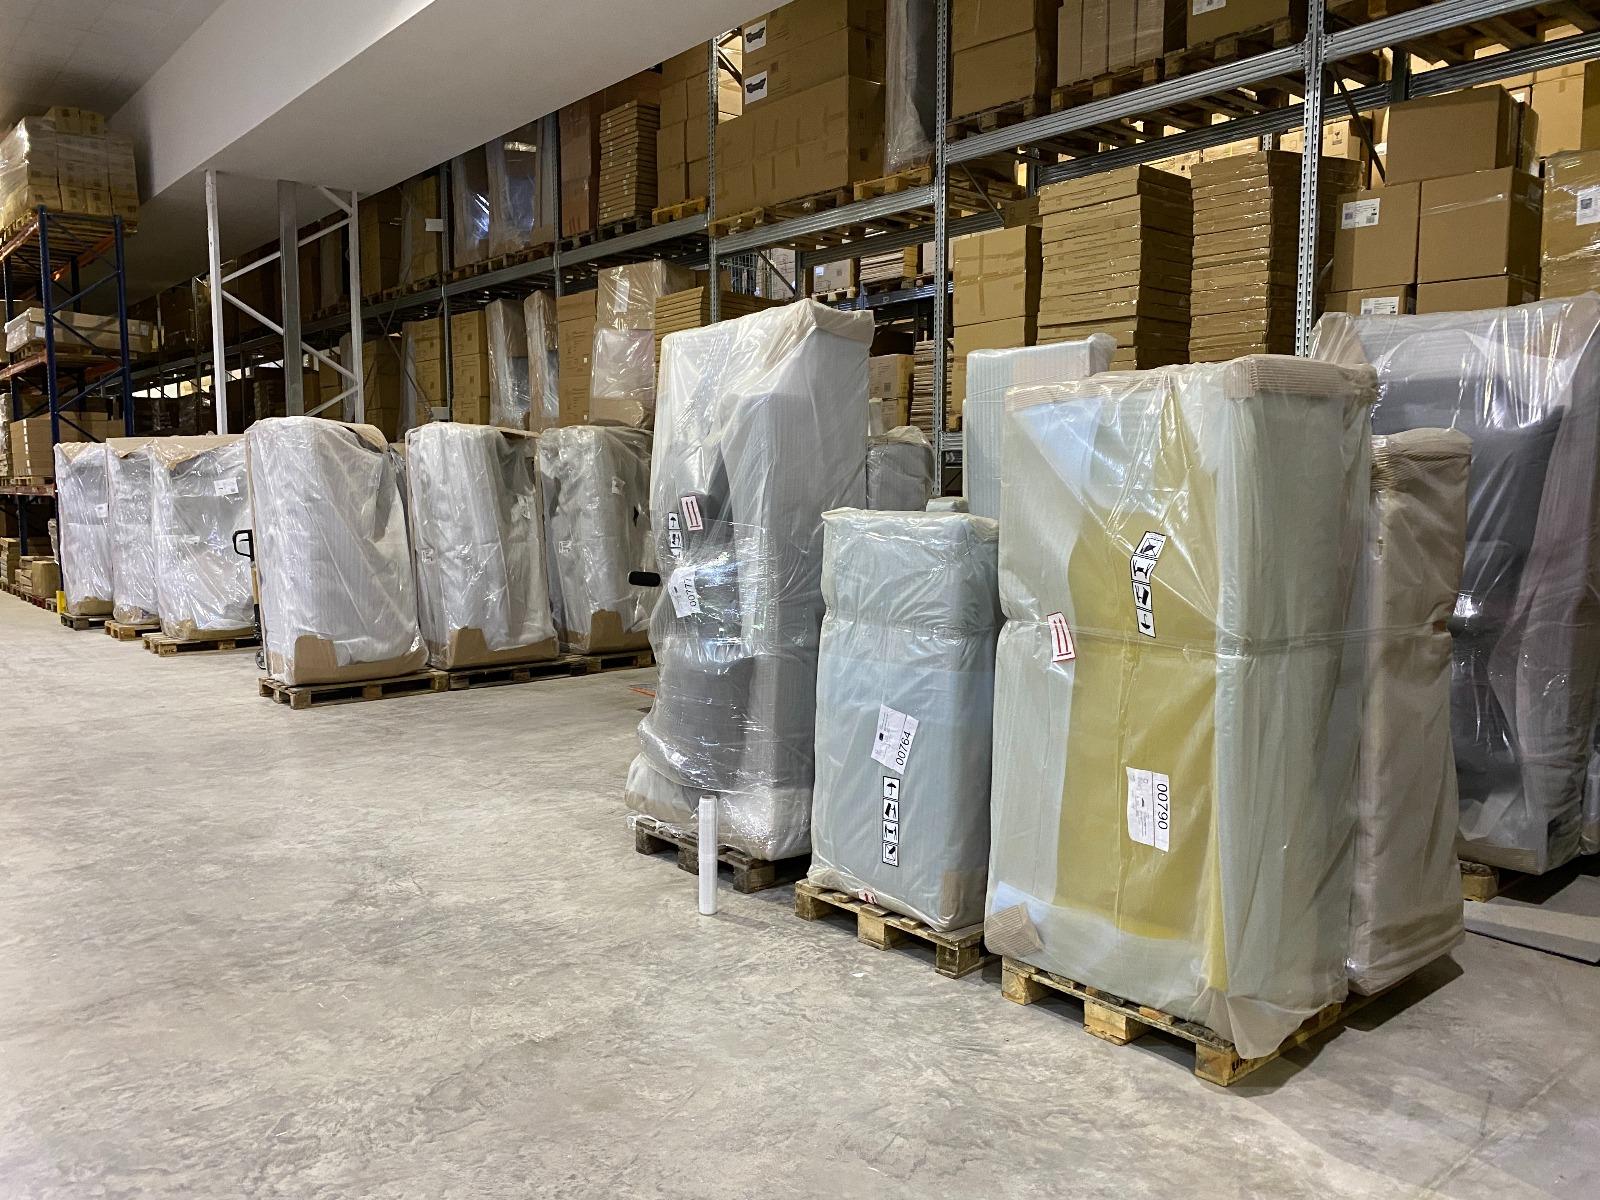 Logistics warehouse image #6